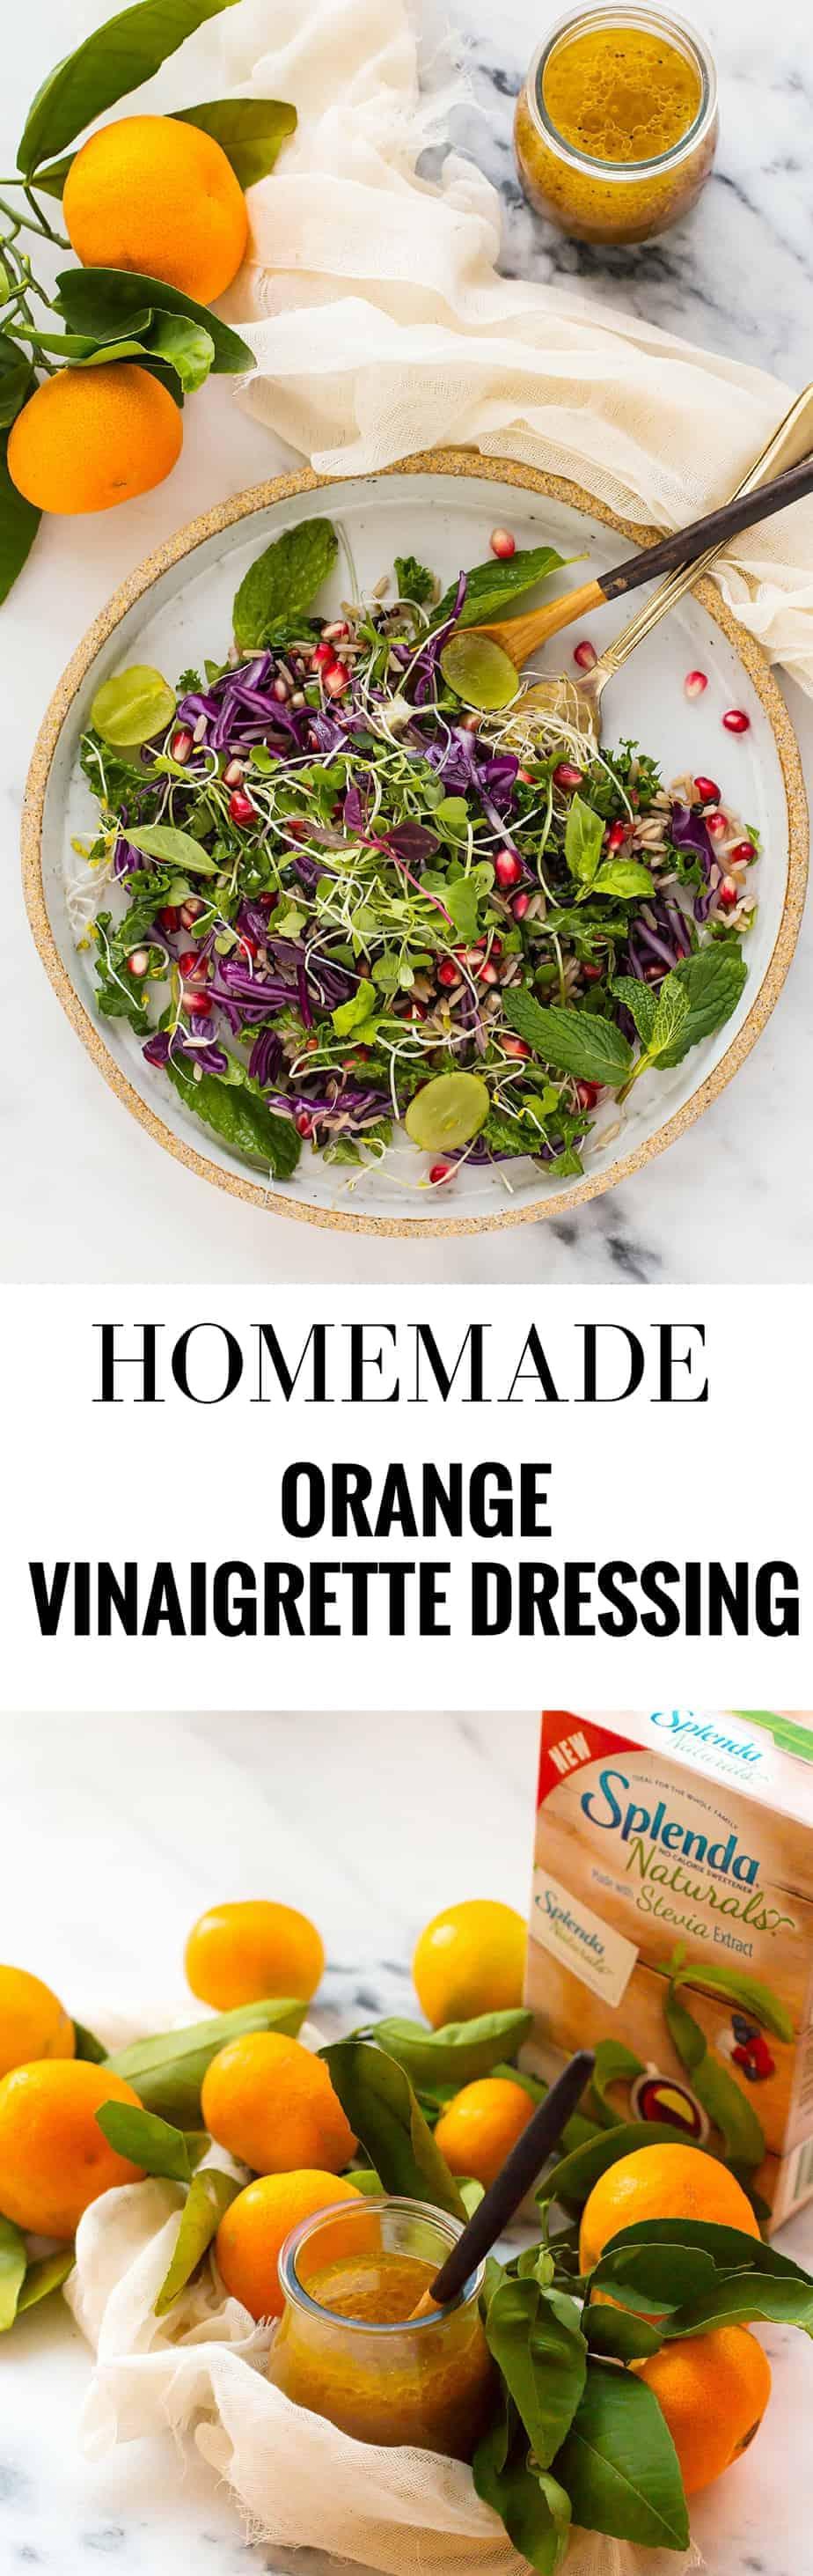 fall-salad-orange-vinaigrette-dressing. LOW CARB DRESSING WITH STEVIA